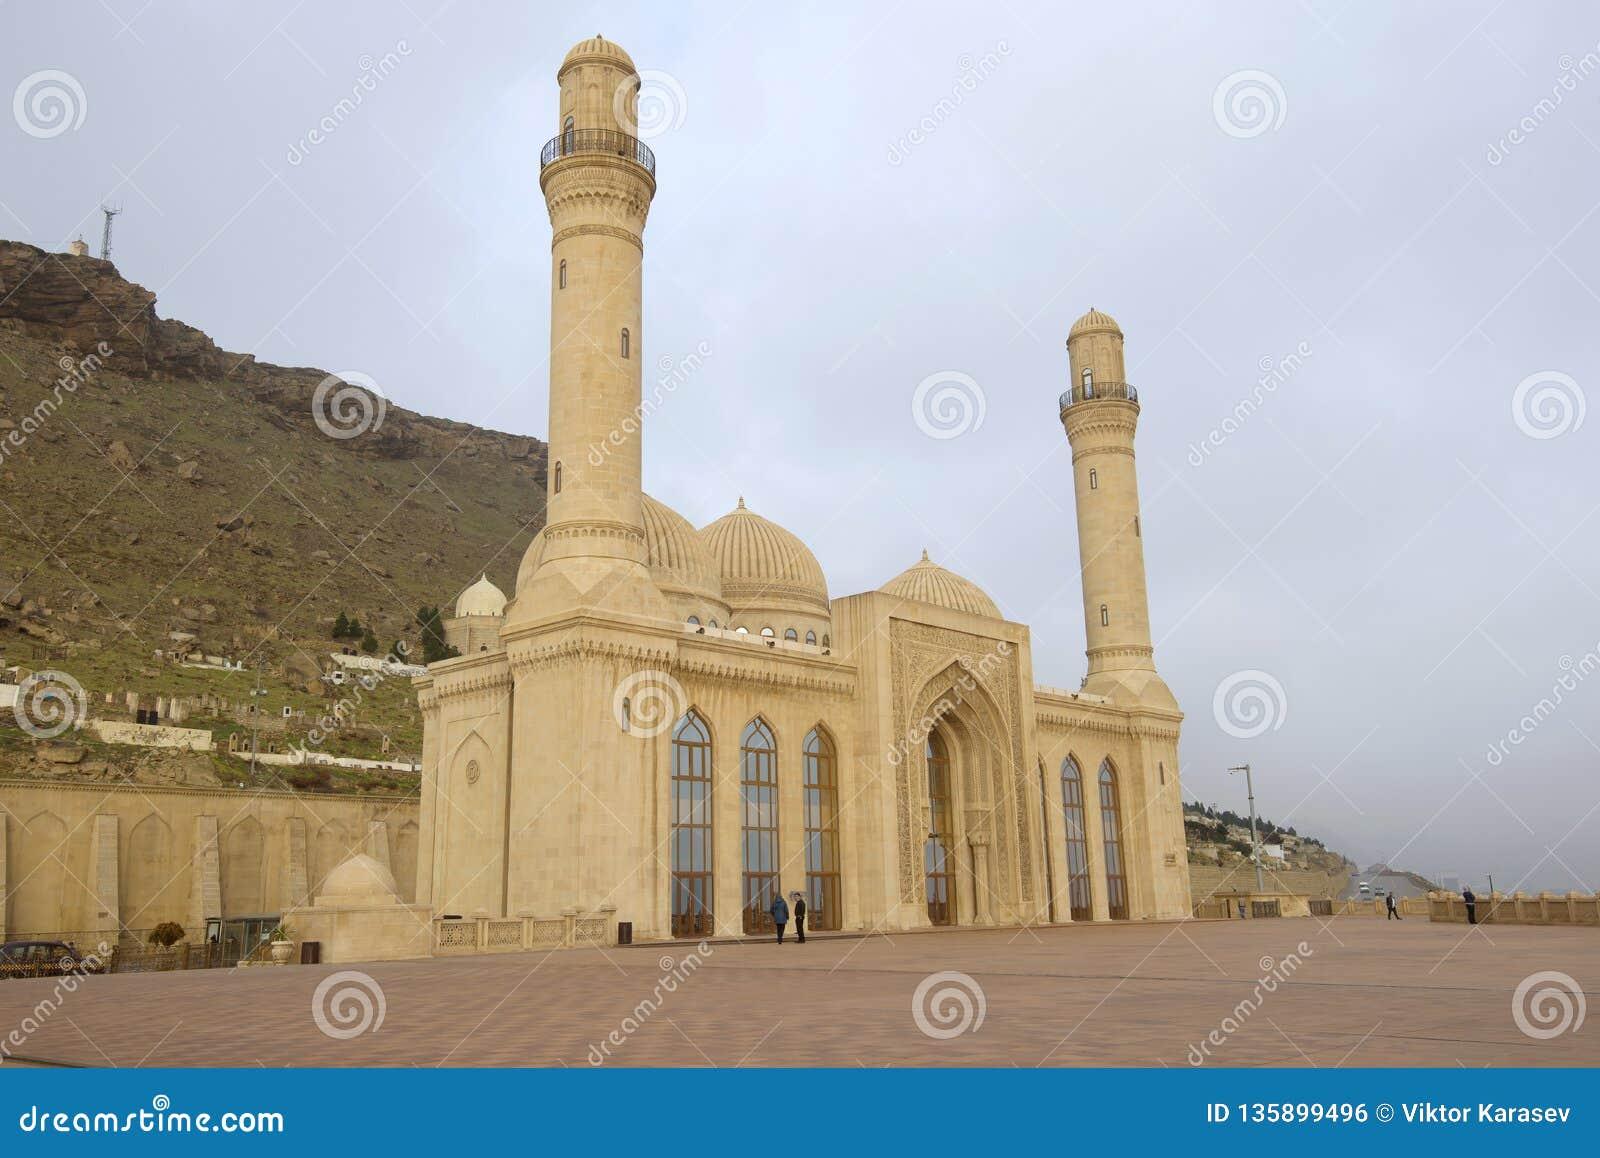 Återställd Shiite moské Bibi-Eybat, Januari morgon Baku Azerbajdzjan